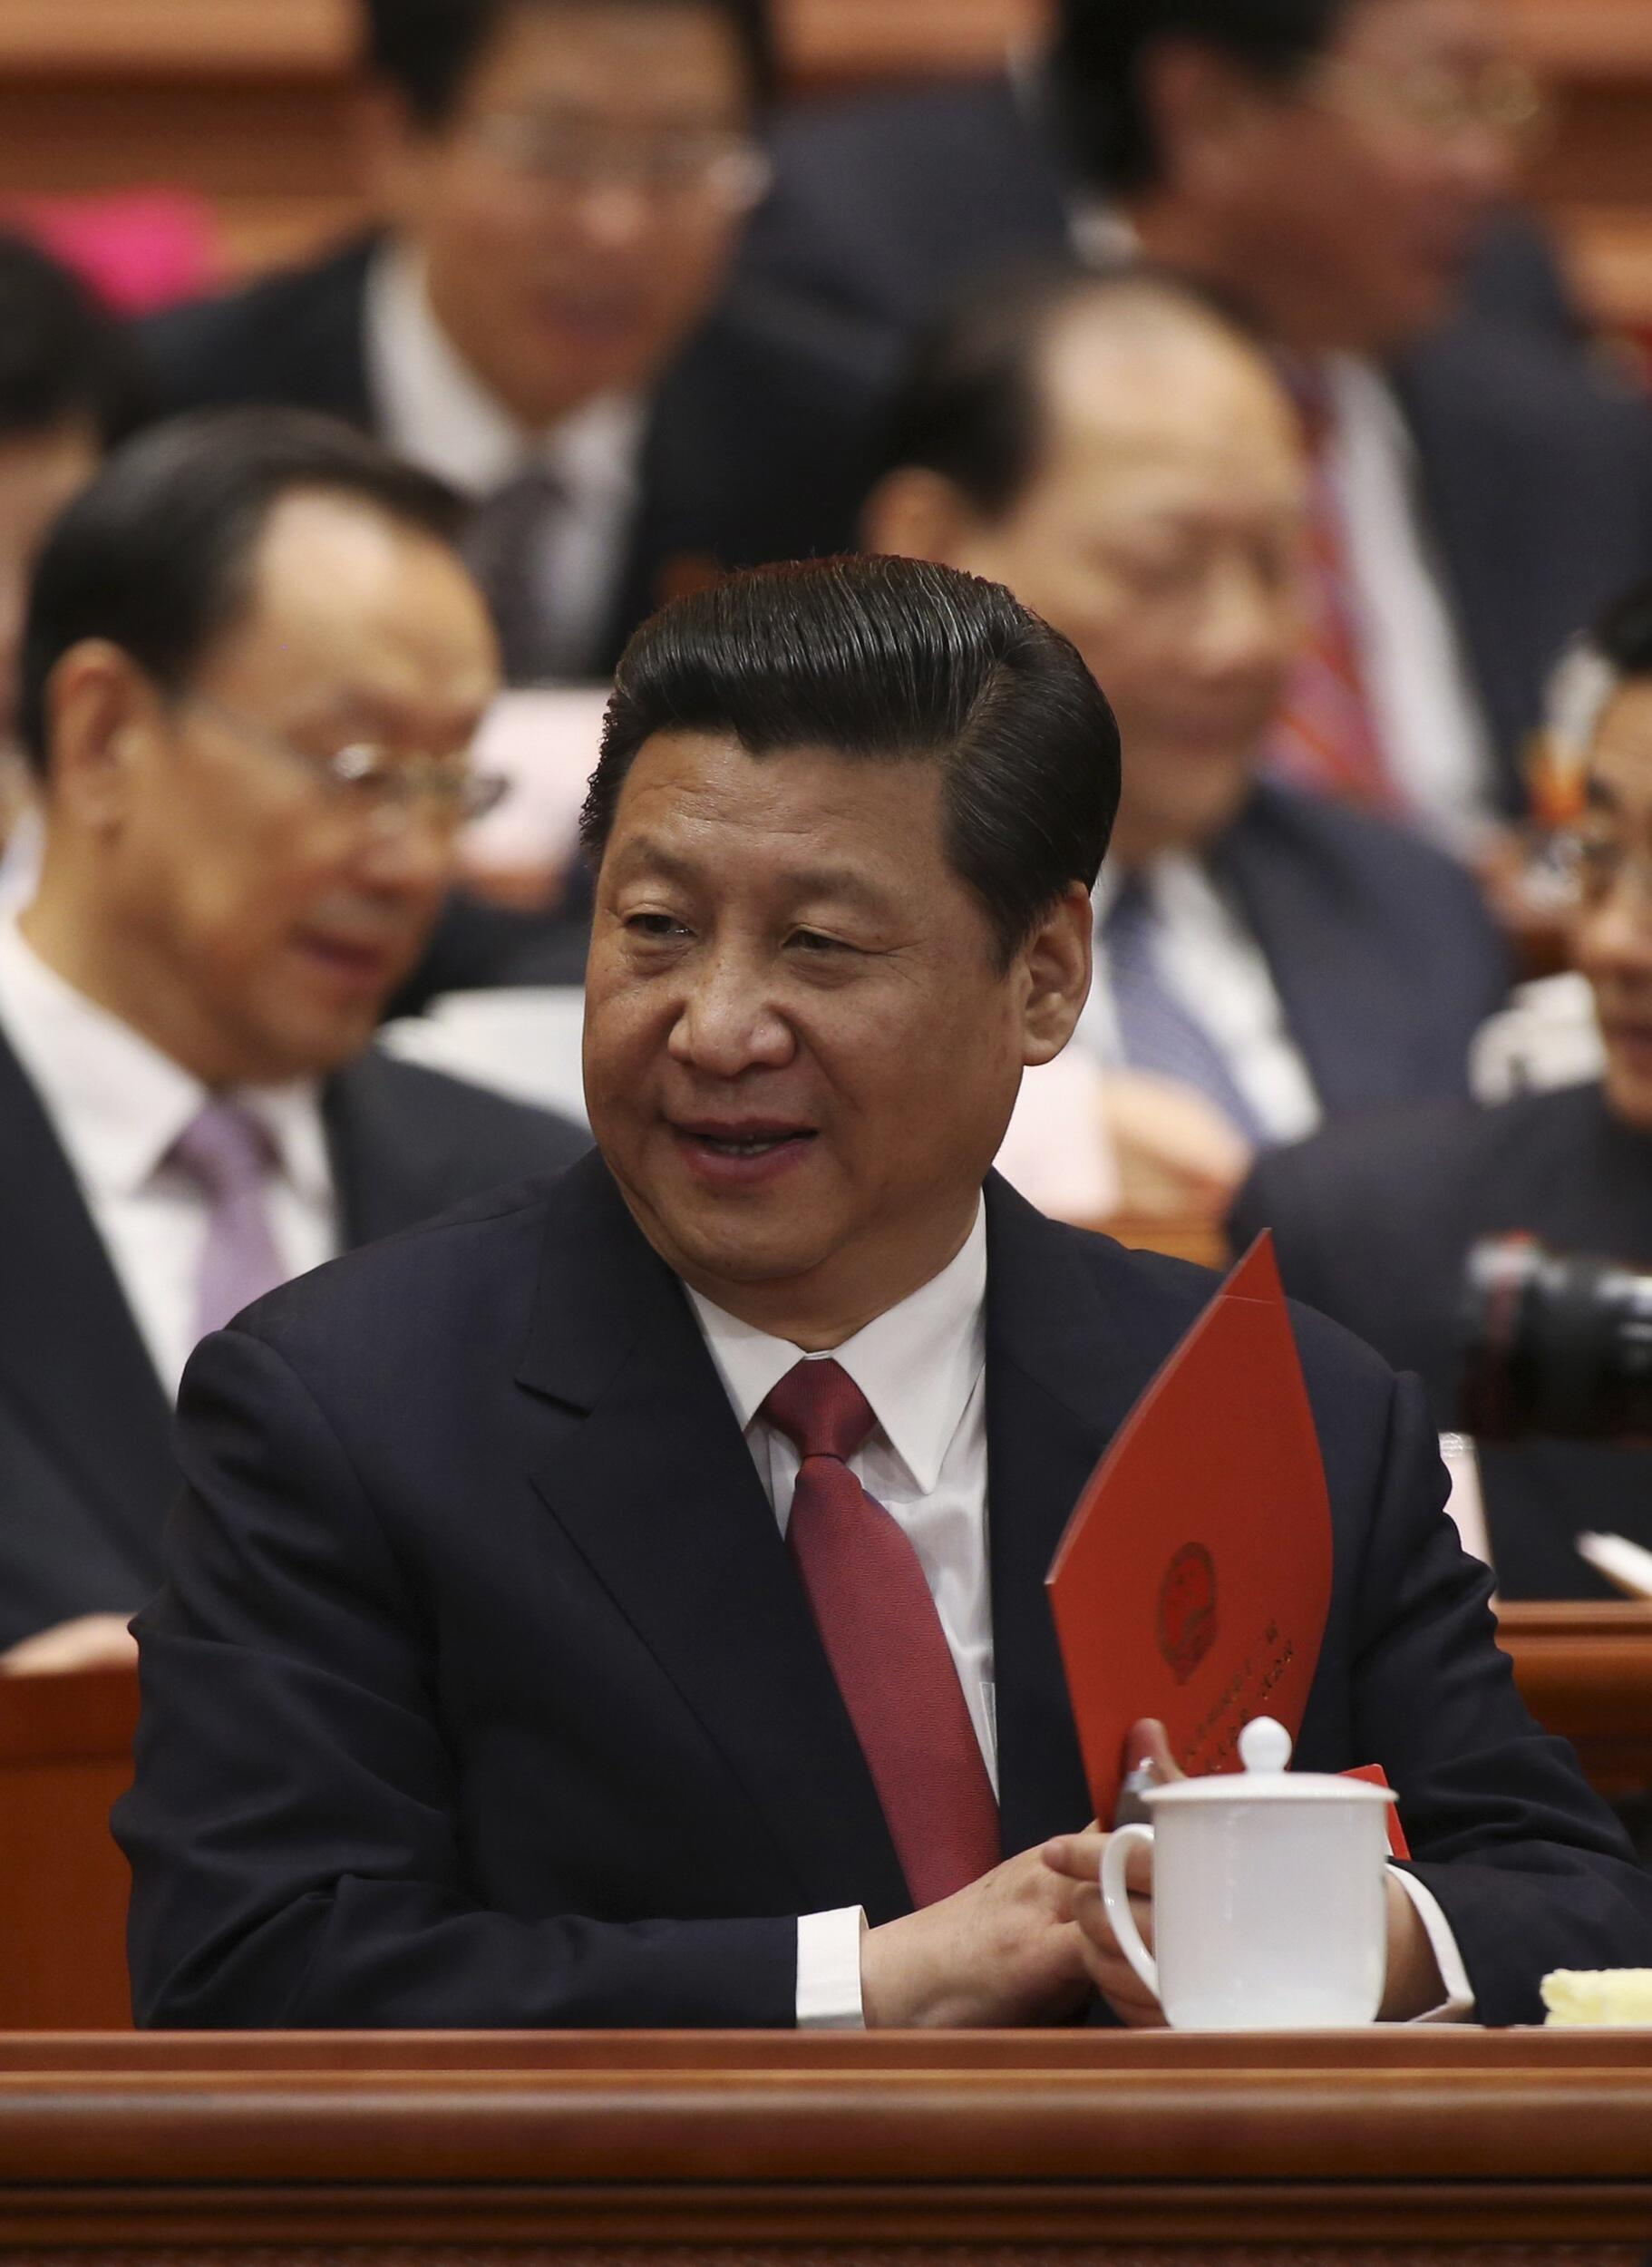 Aos 59 anos, Xi Jinping sucede a Hu Jintao na presidência da China.